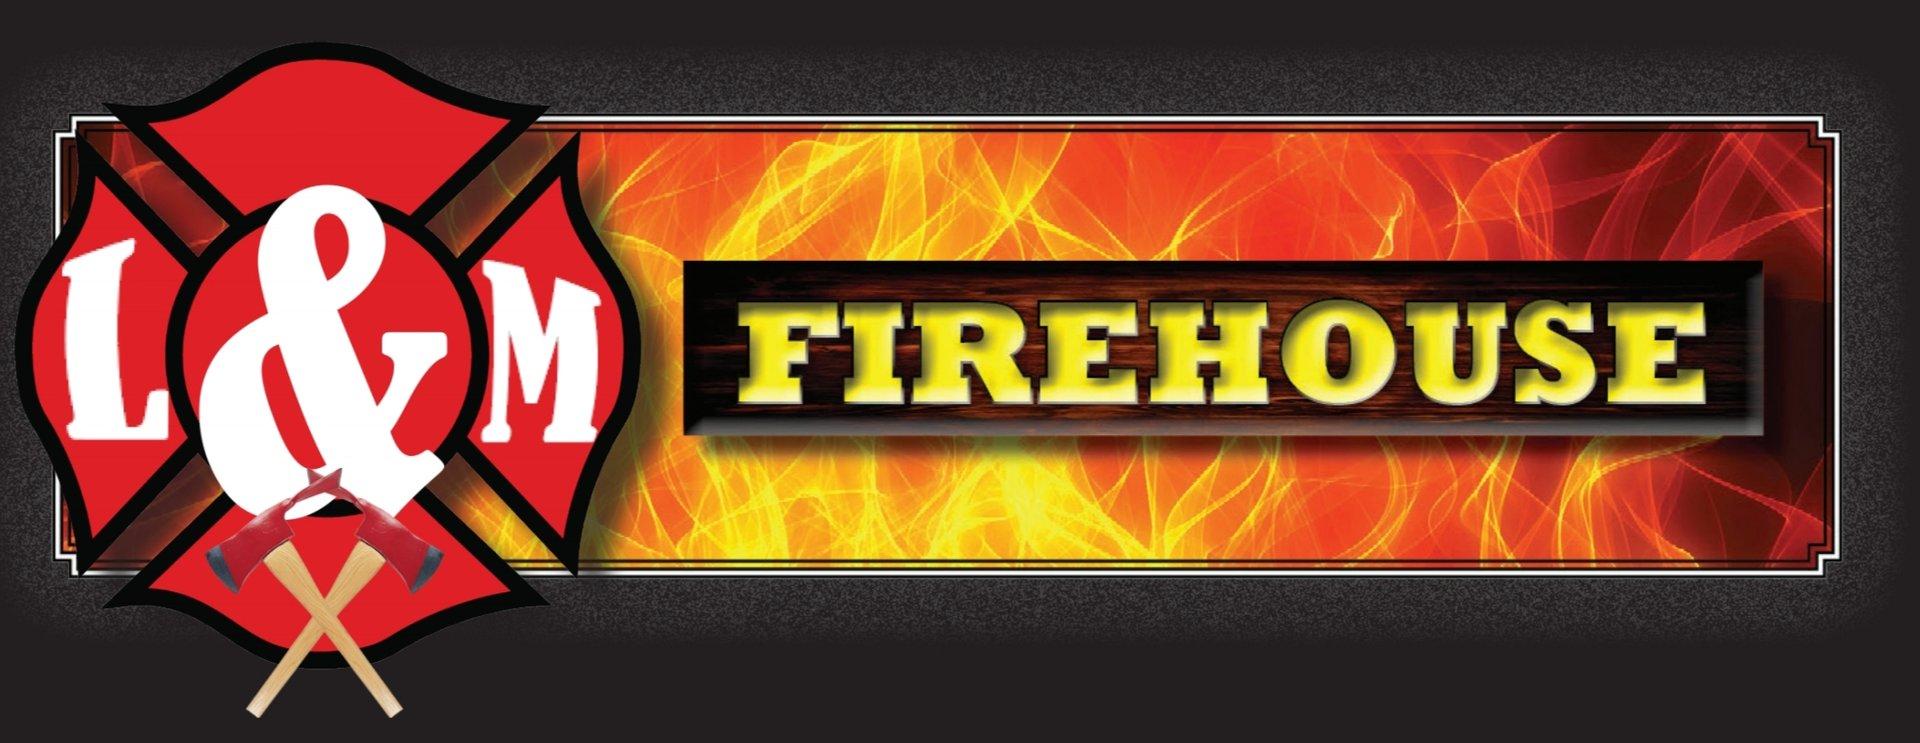 L&M Firehouse